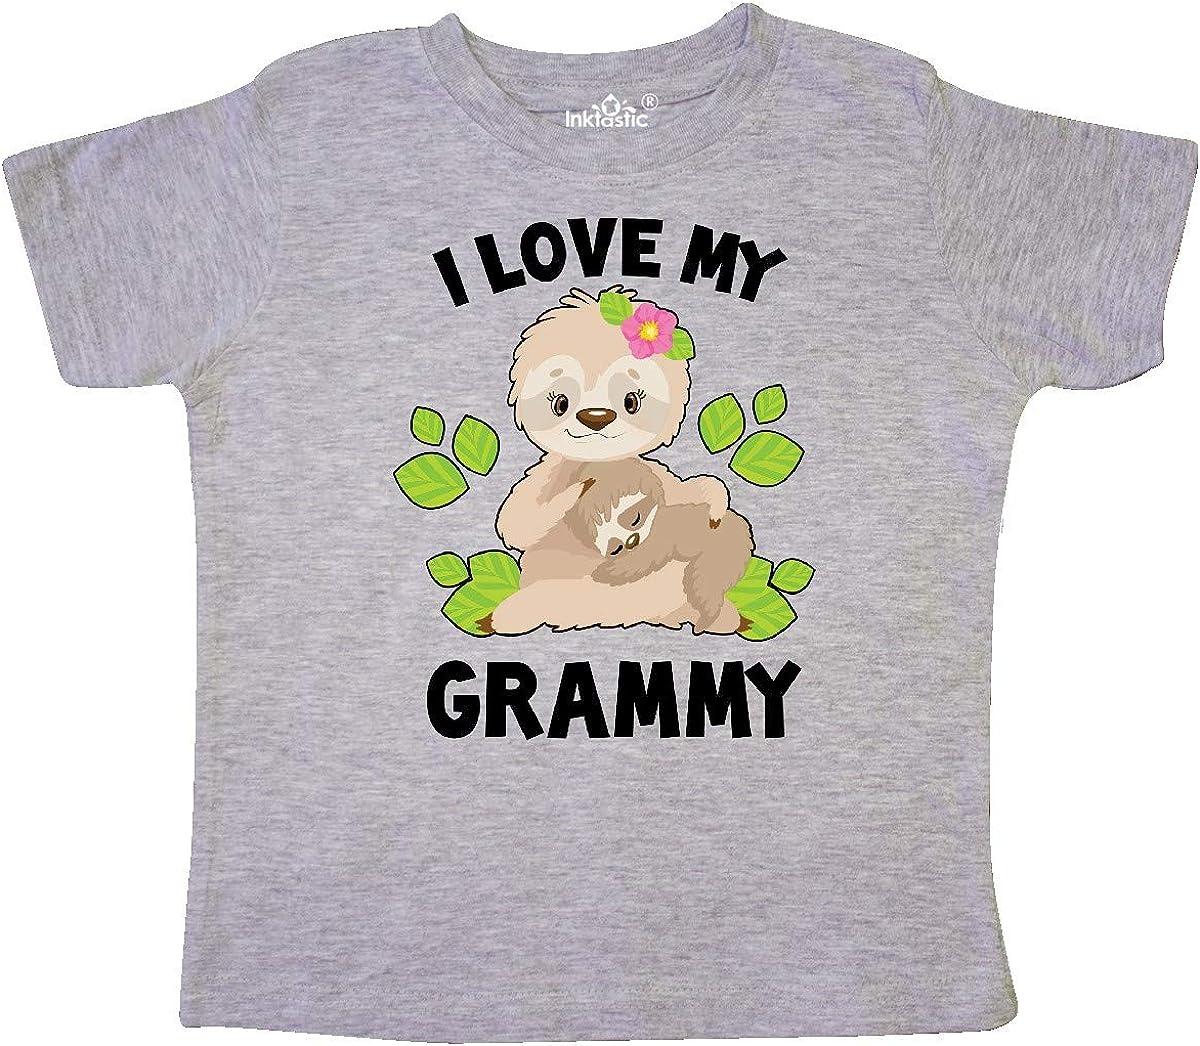 inktastic Grammys Little Lady Toddler T-Shirt